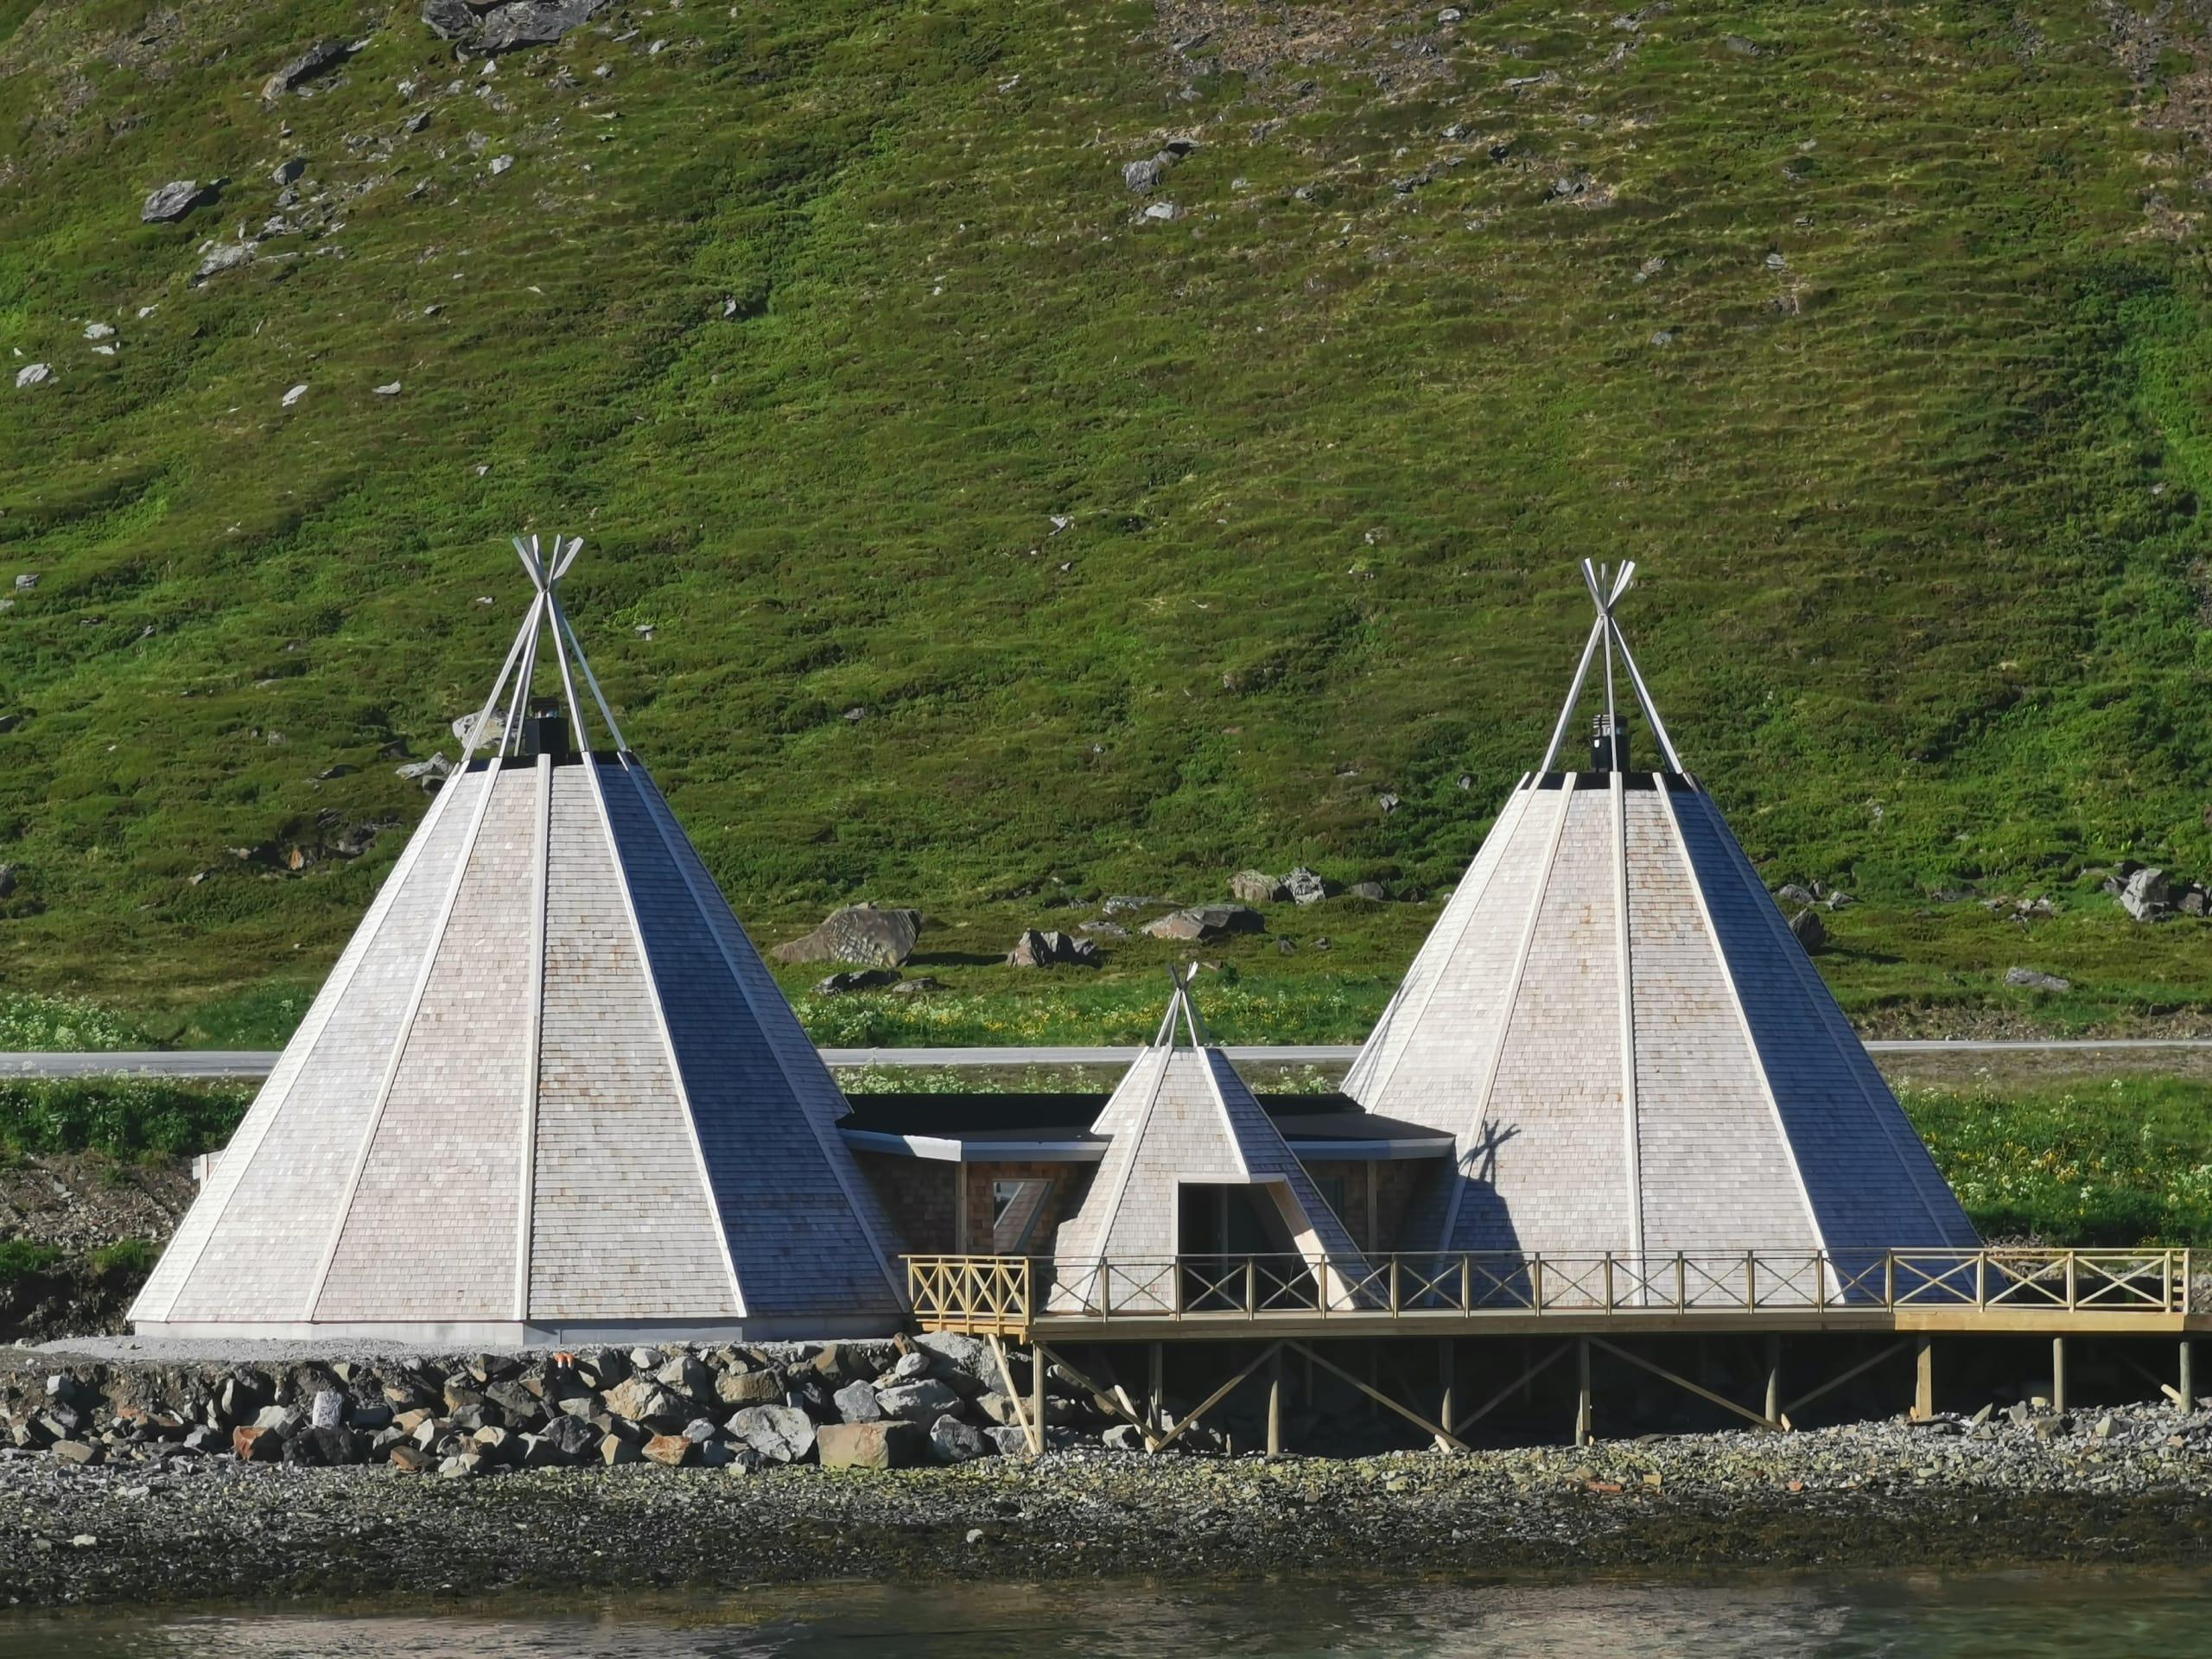 Sarnes sami camp